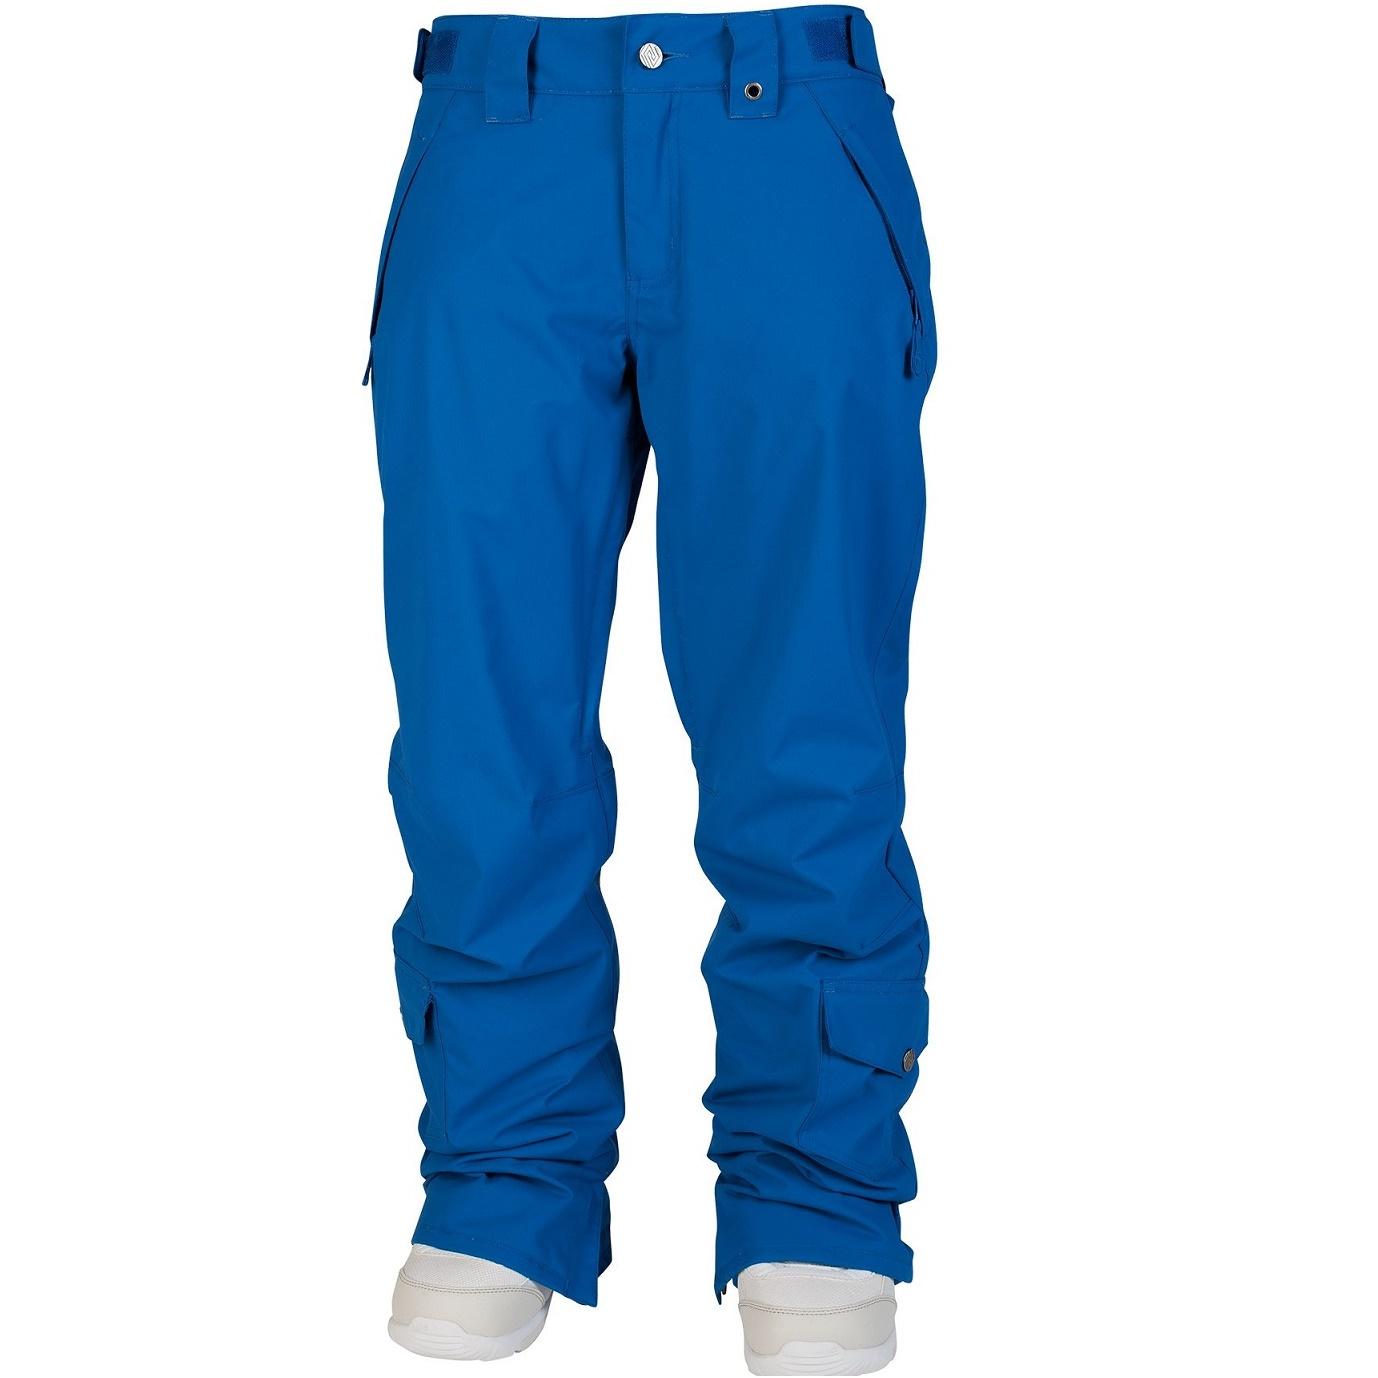 Nitro dámské kalhoty na snowboard So Quiet Blue Velikost: S Doprava zdarma